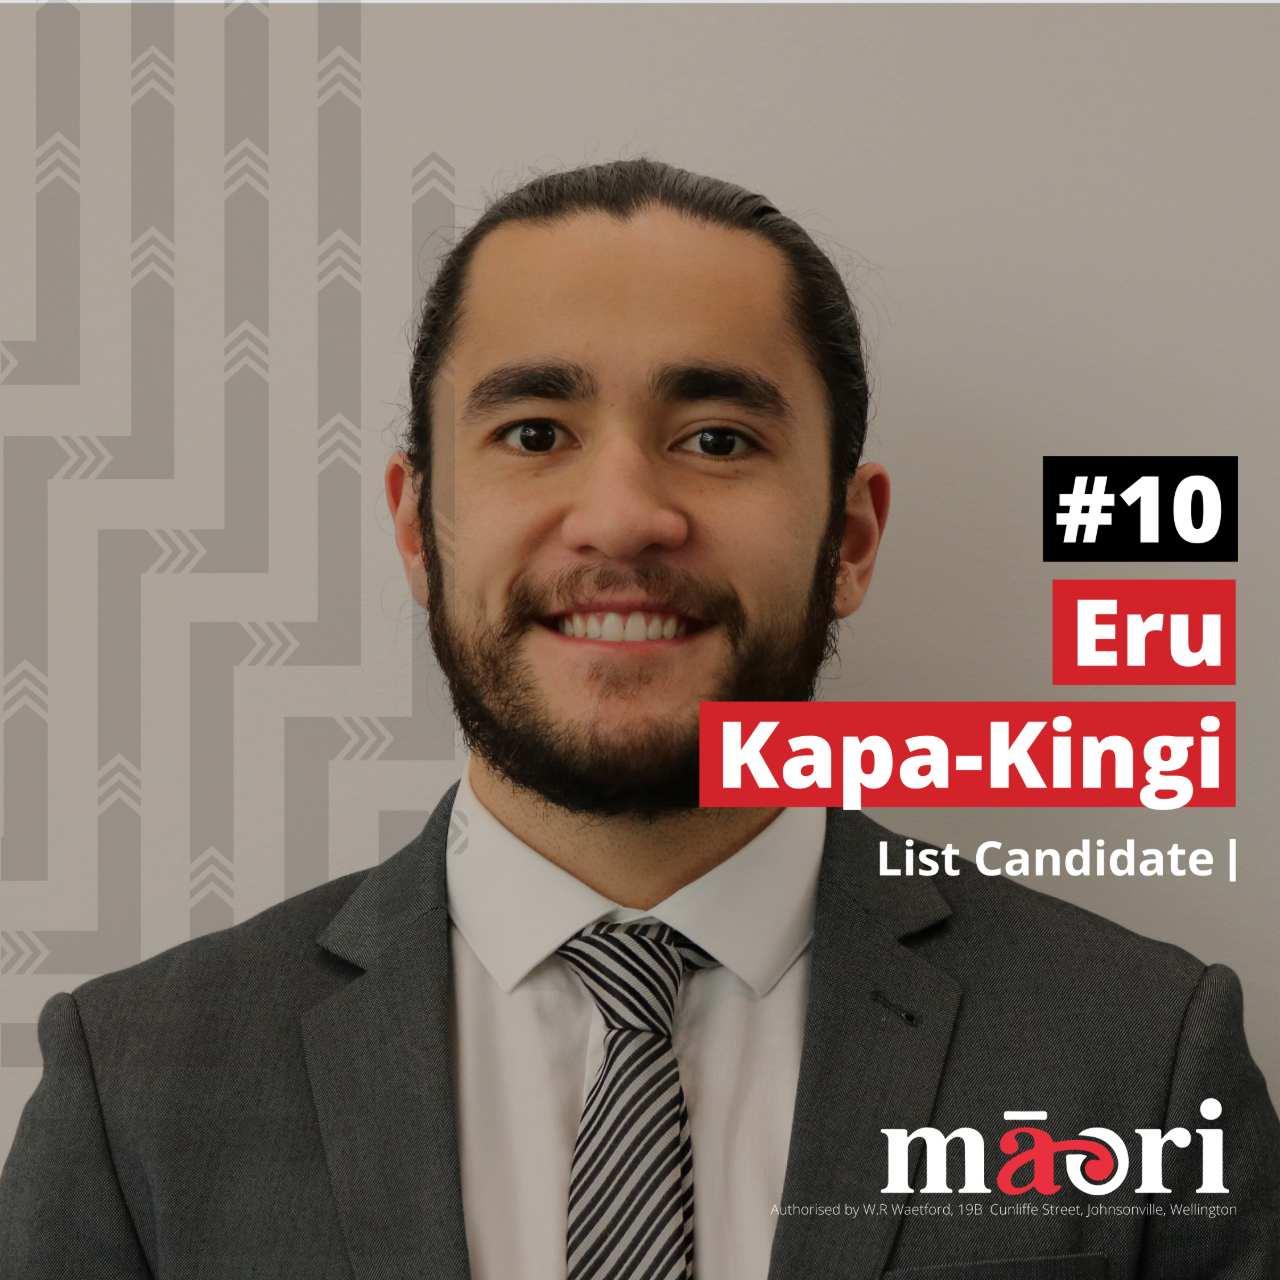 Eru Kapa-Kingi, List Candidate